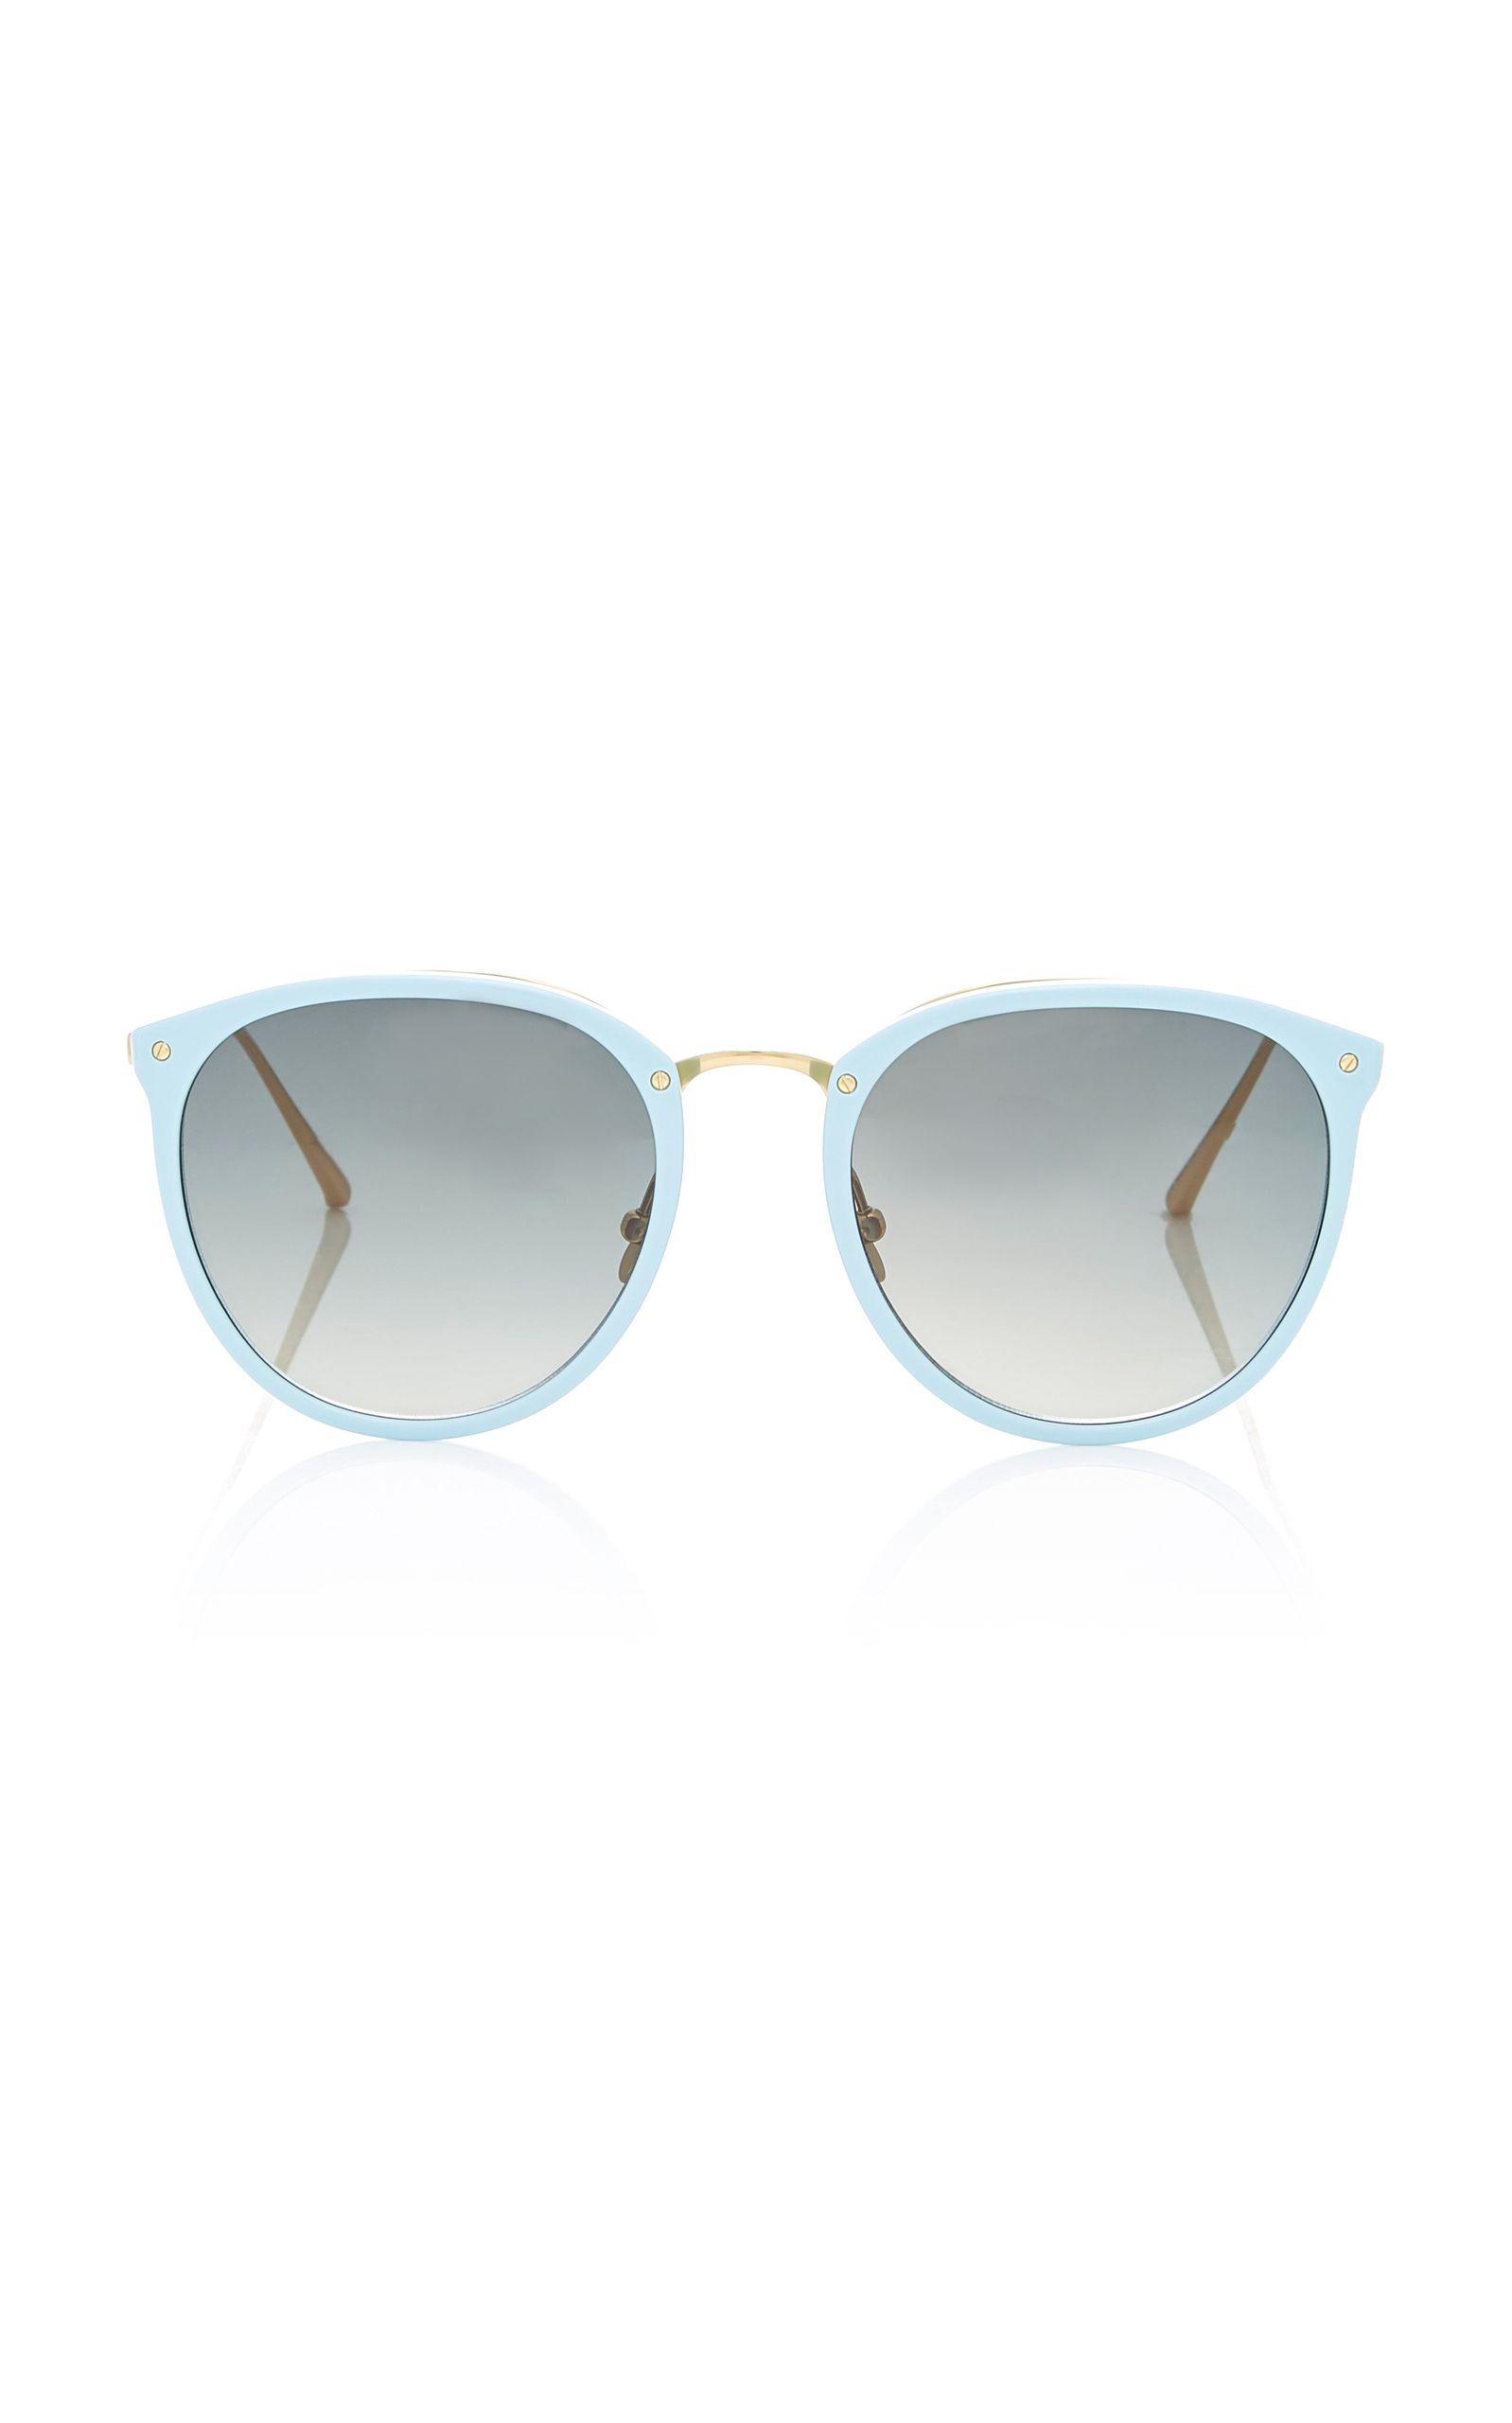 c3d8e5c2dc83 Butterfly-Frame Acetate Sunglasses by LInda Farrow Butterfly Frame, Linda  Farrow, Contemporary Design